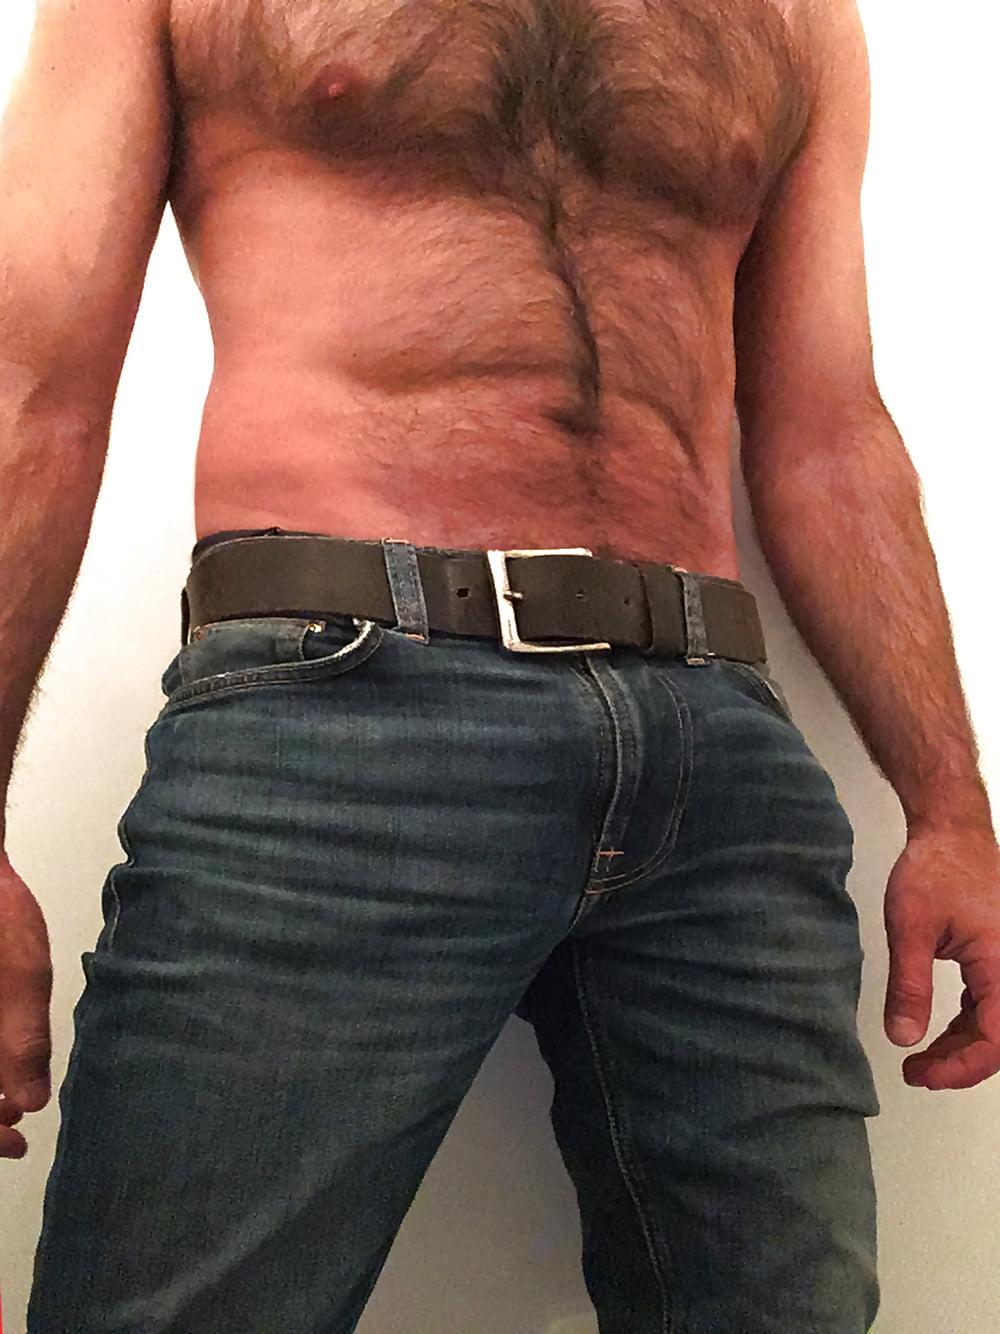 Gay monster cock dick